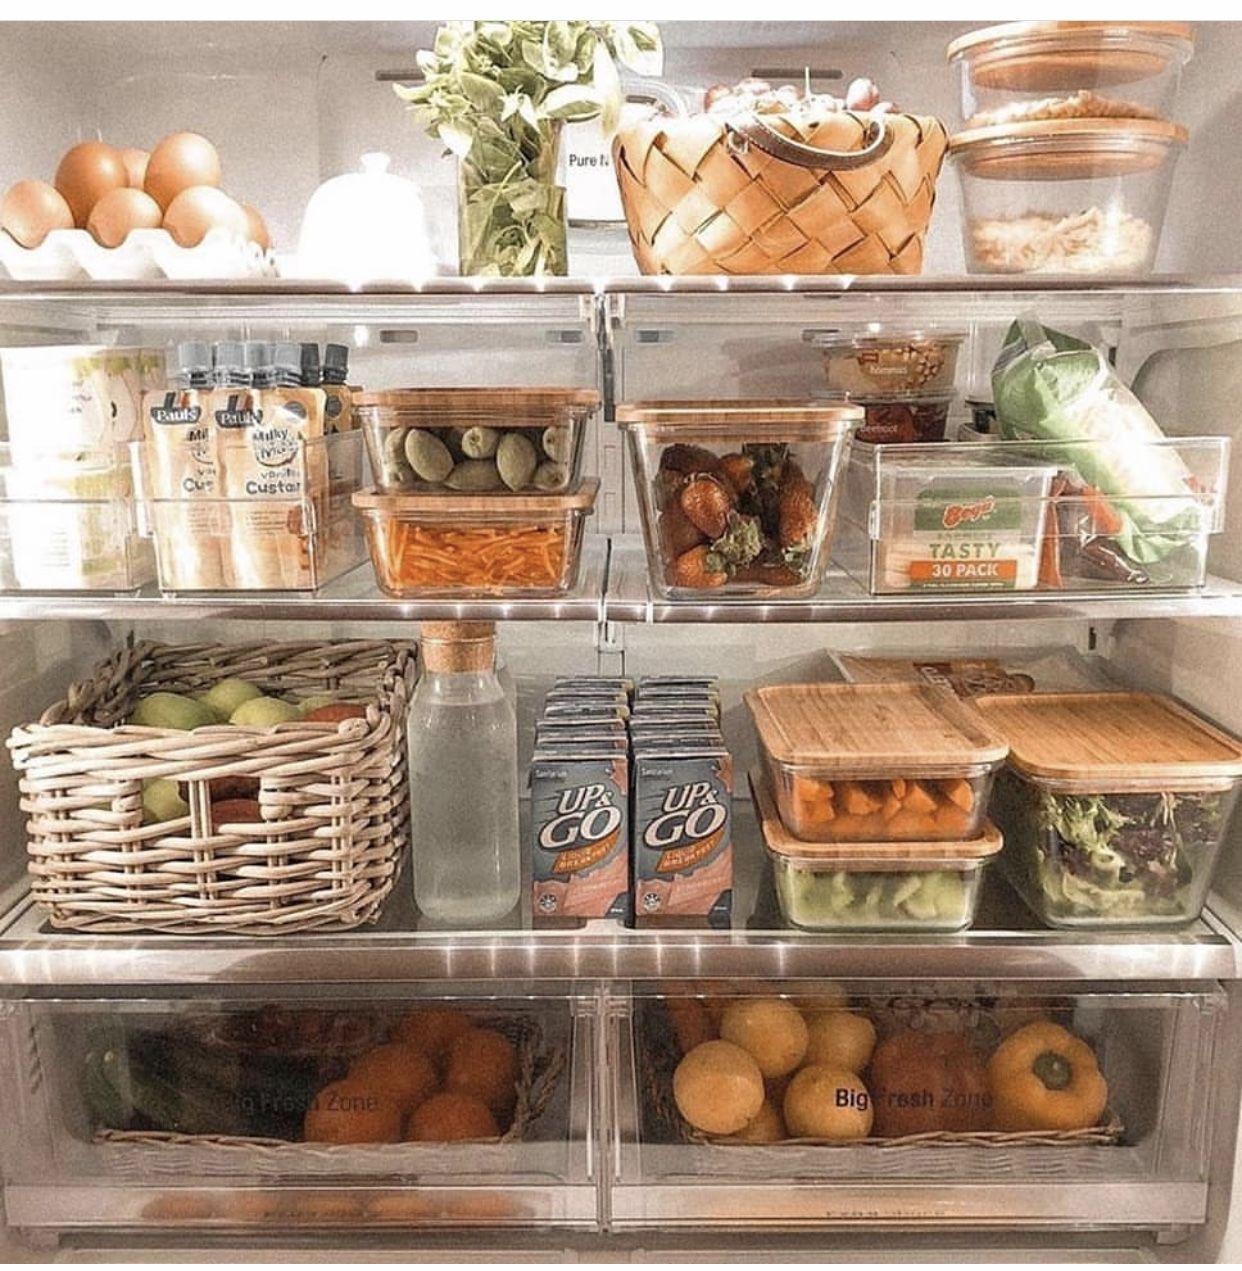 Pin By Maddy Weston On Home Healthy Fridge Fridge Organization Trendy Kitchen